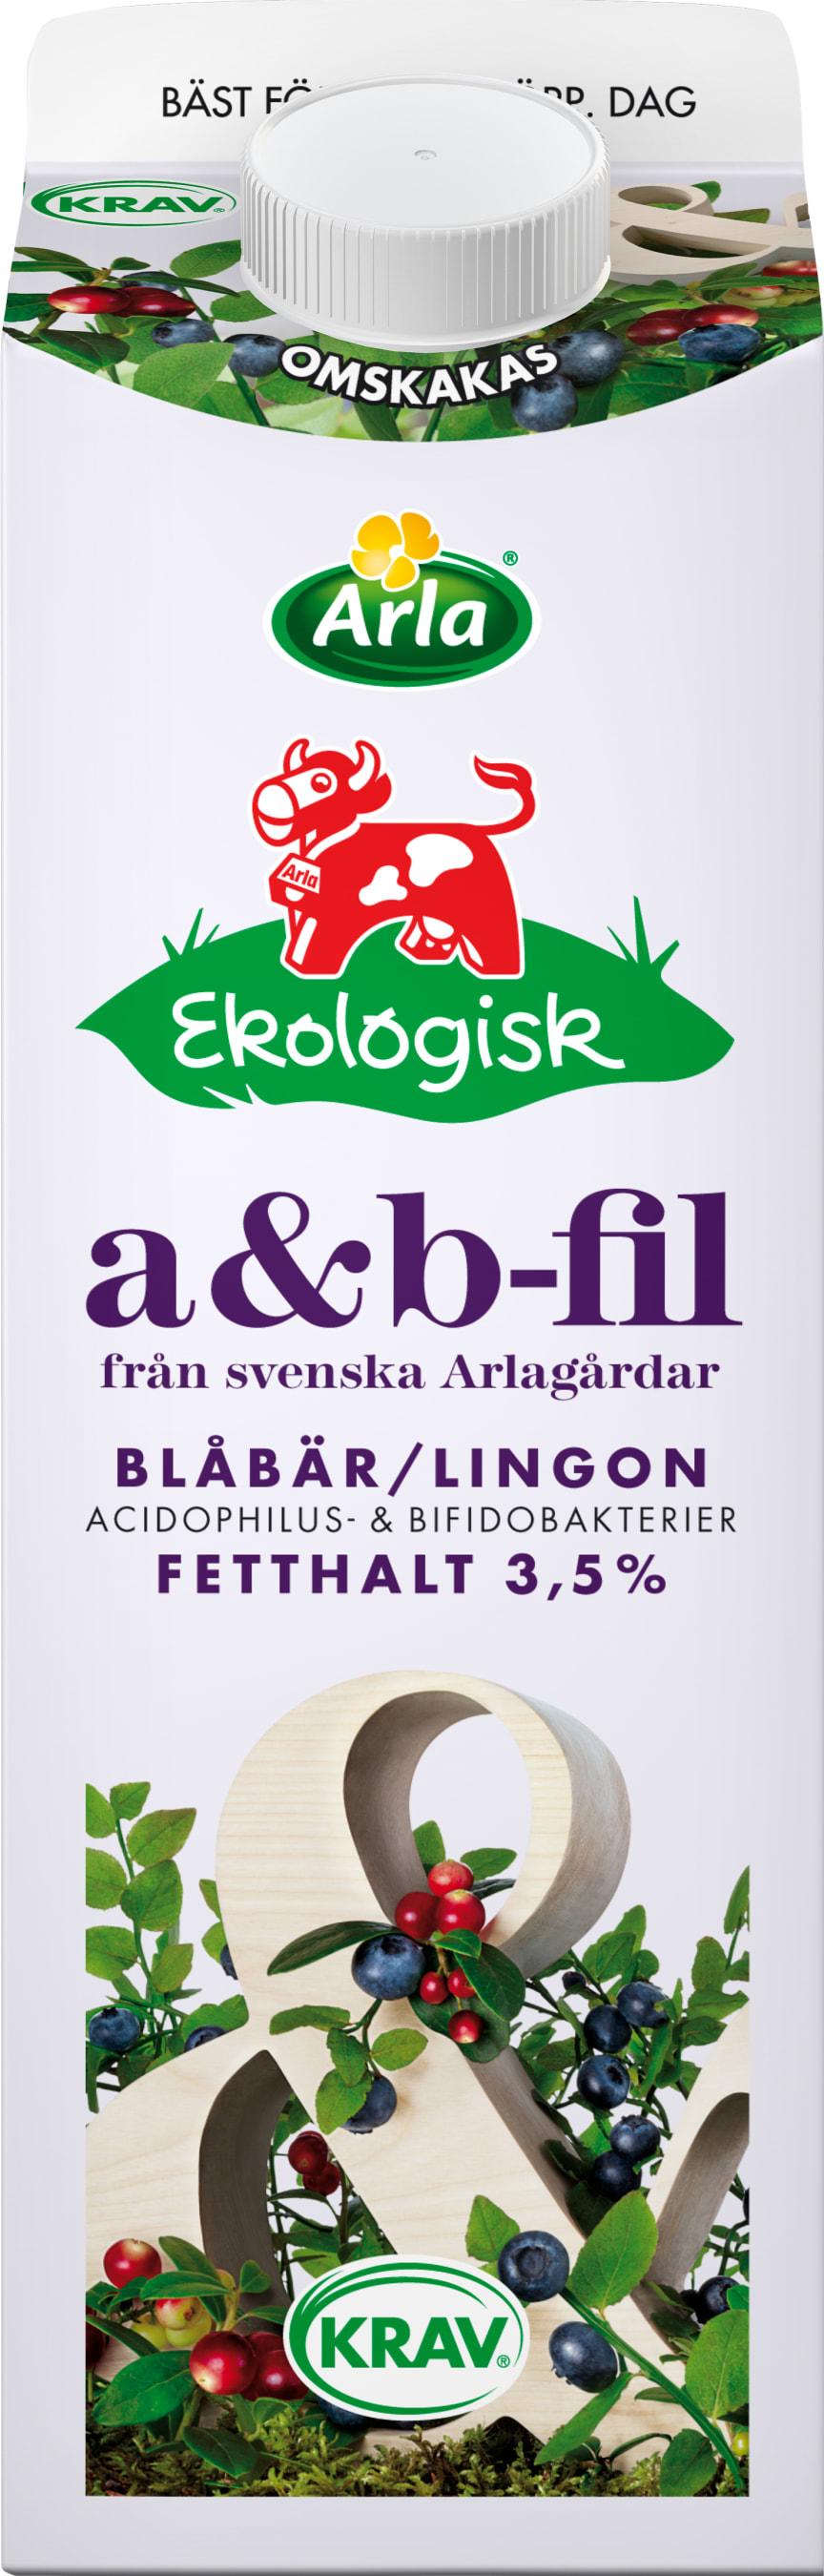 Arla a&b-fil blåbär/lingon 3,5 %